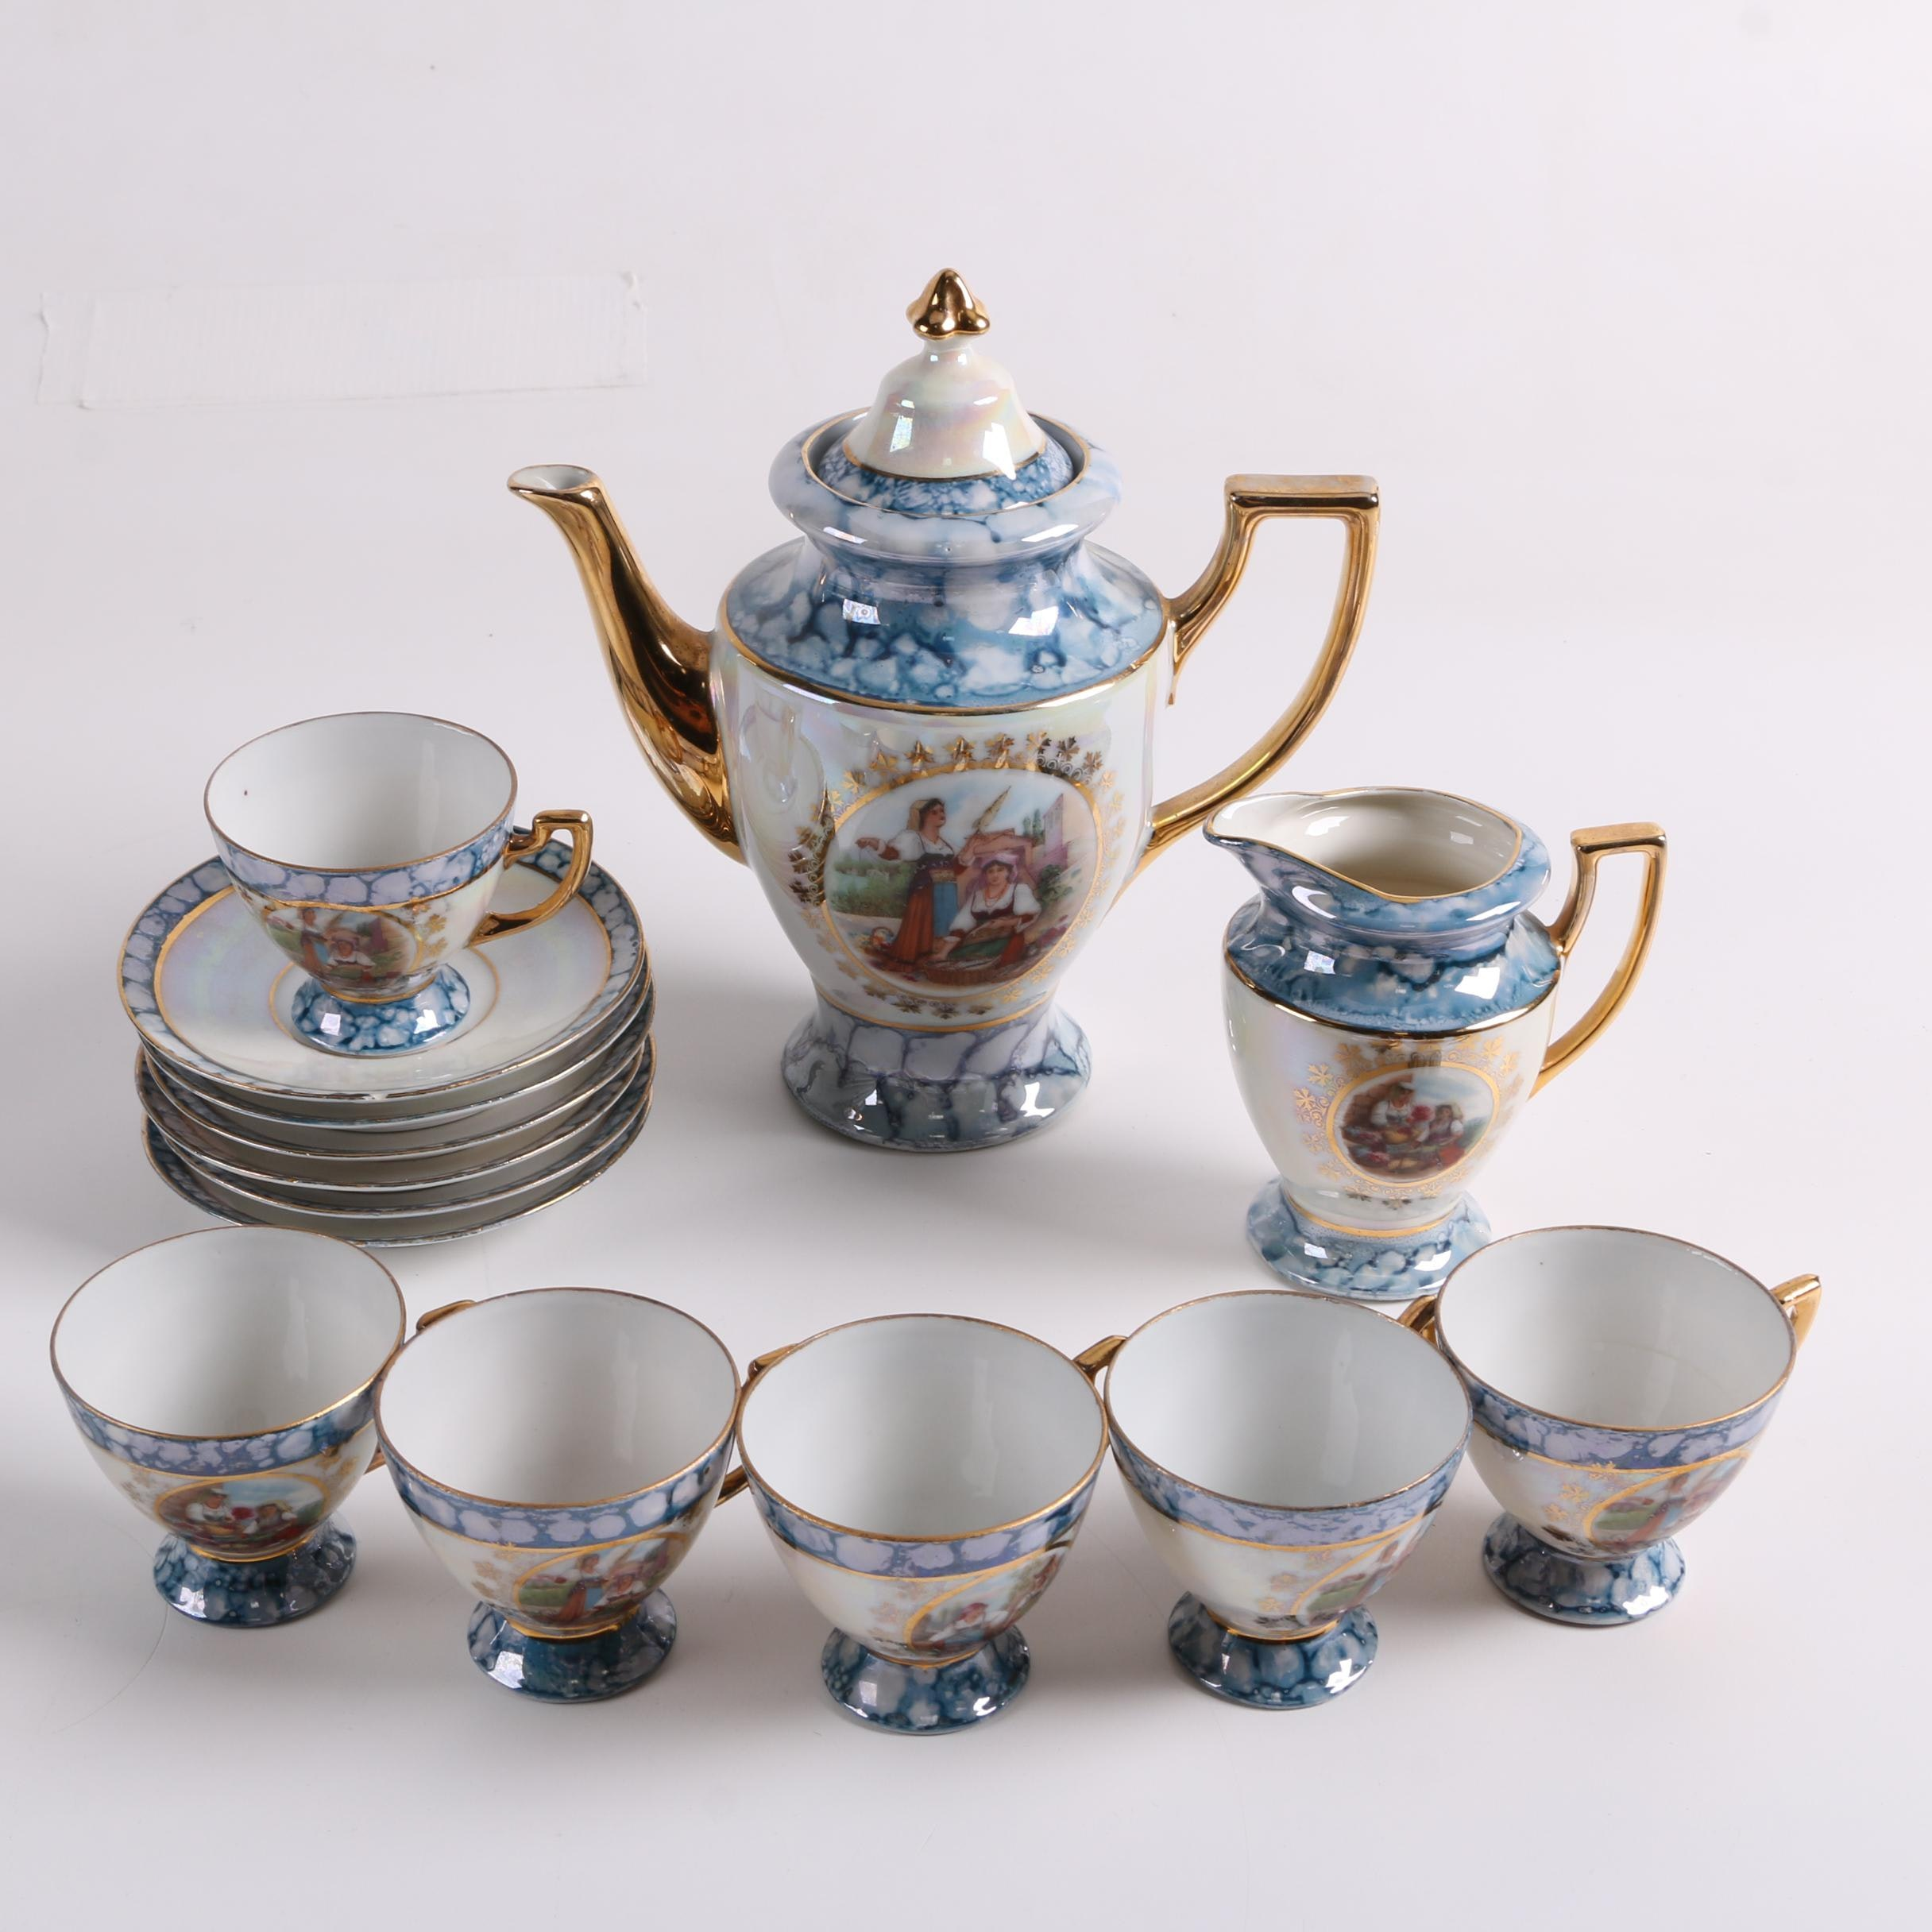 Vintage German Lusterware Porcelain Demitasse Set